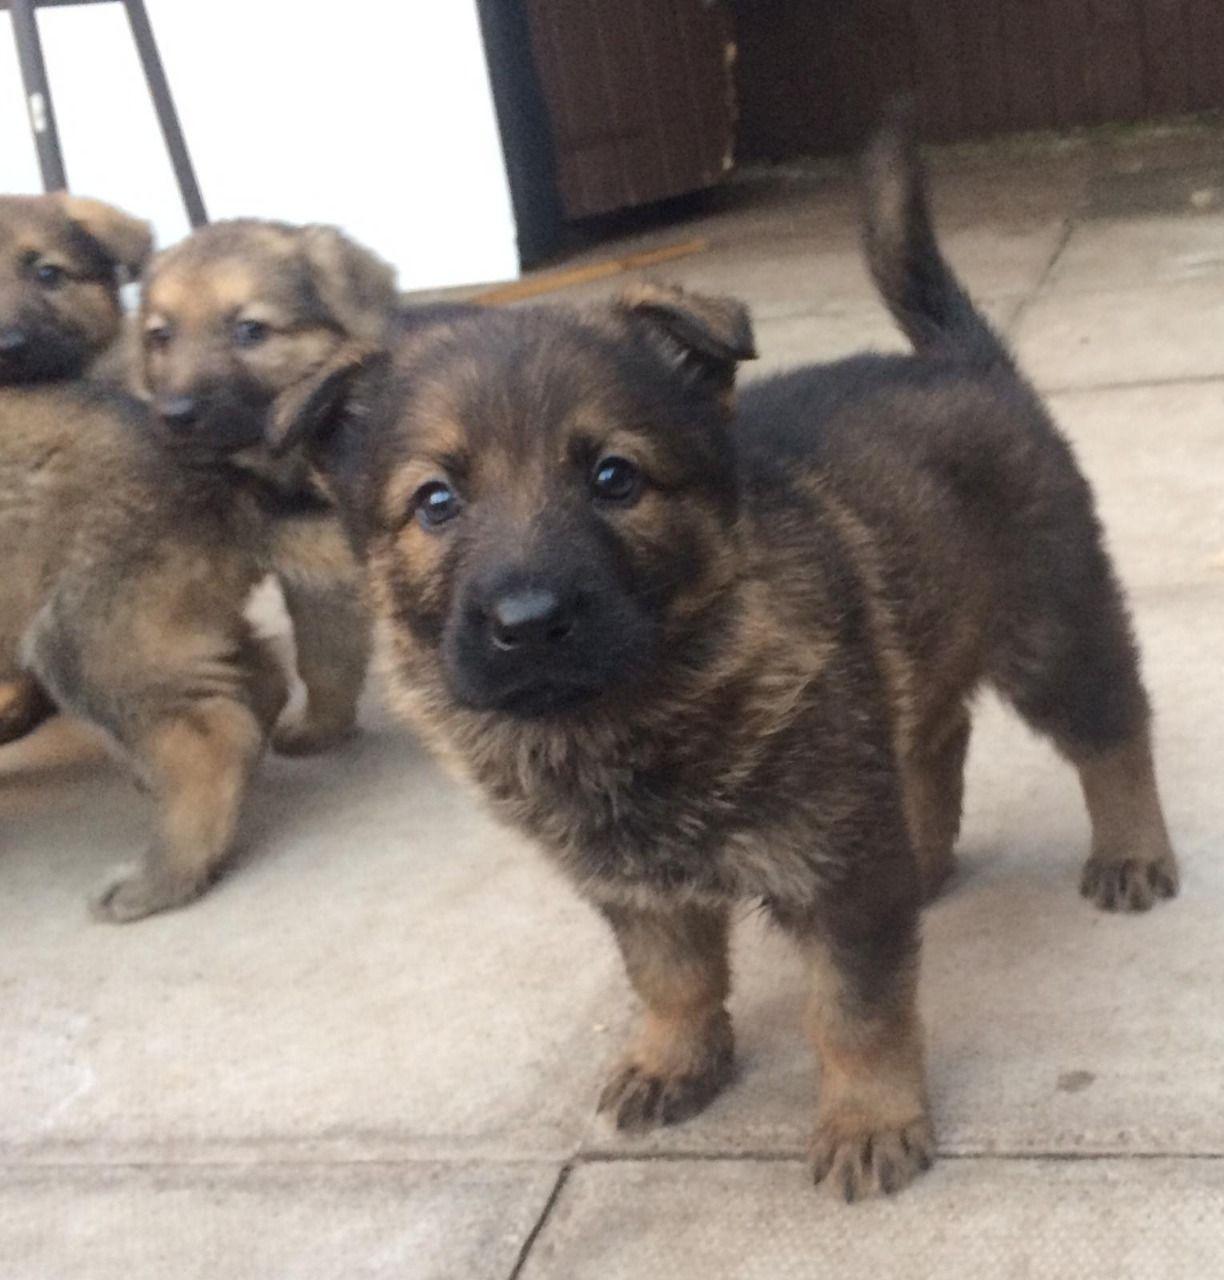 Lovely German Shepherd Puppies For Sale Akclassy Com